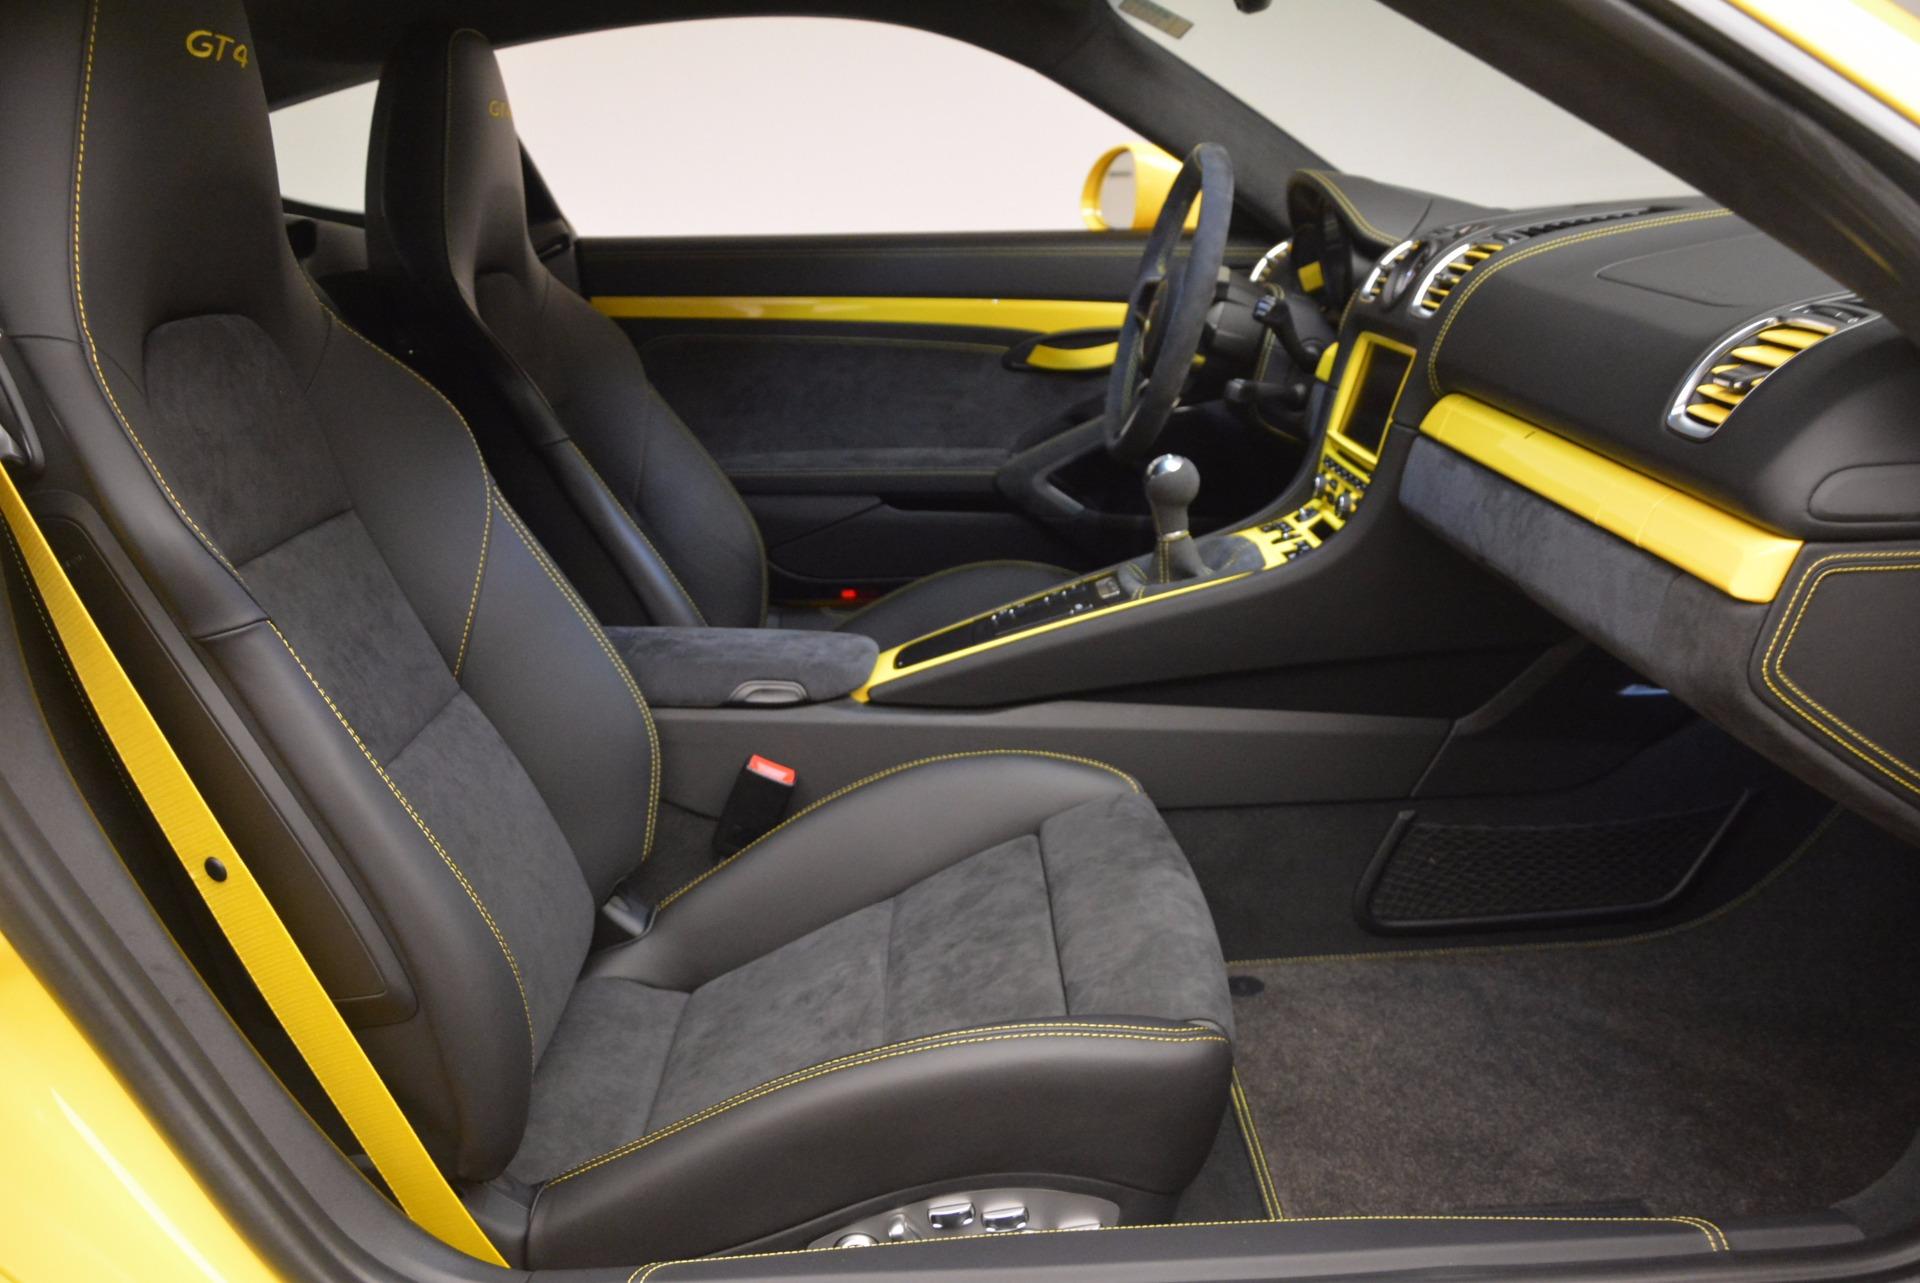 Used 2016 Porsche Cayman GT4 For Sale In Greenwich, CT. Alfa Romeo of Greenwich, 7240 1401_p18